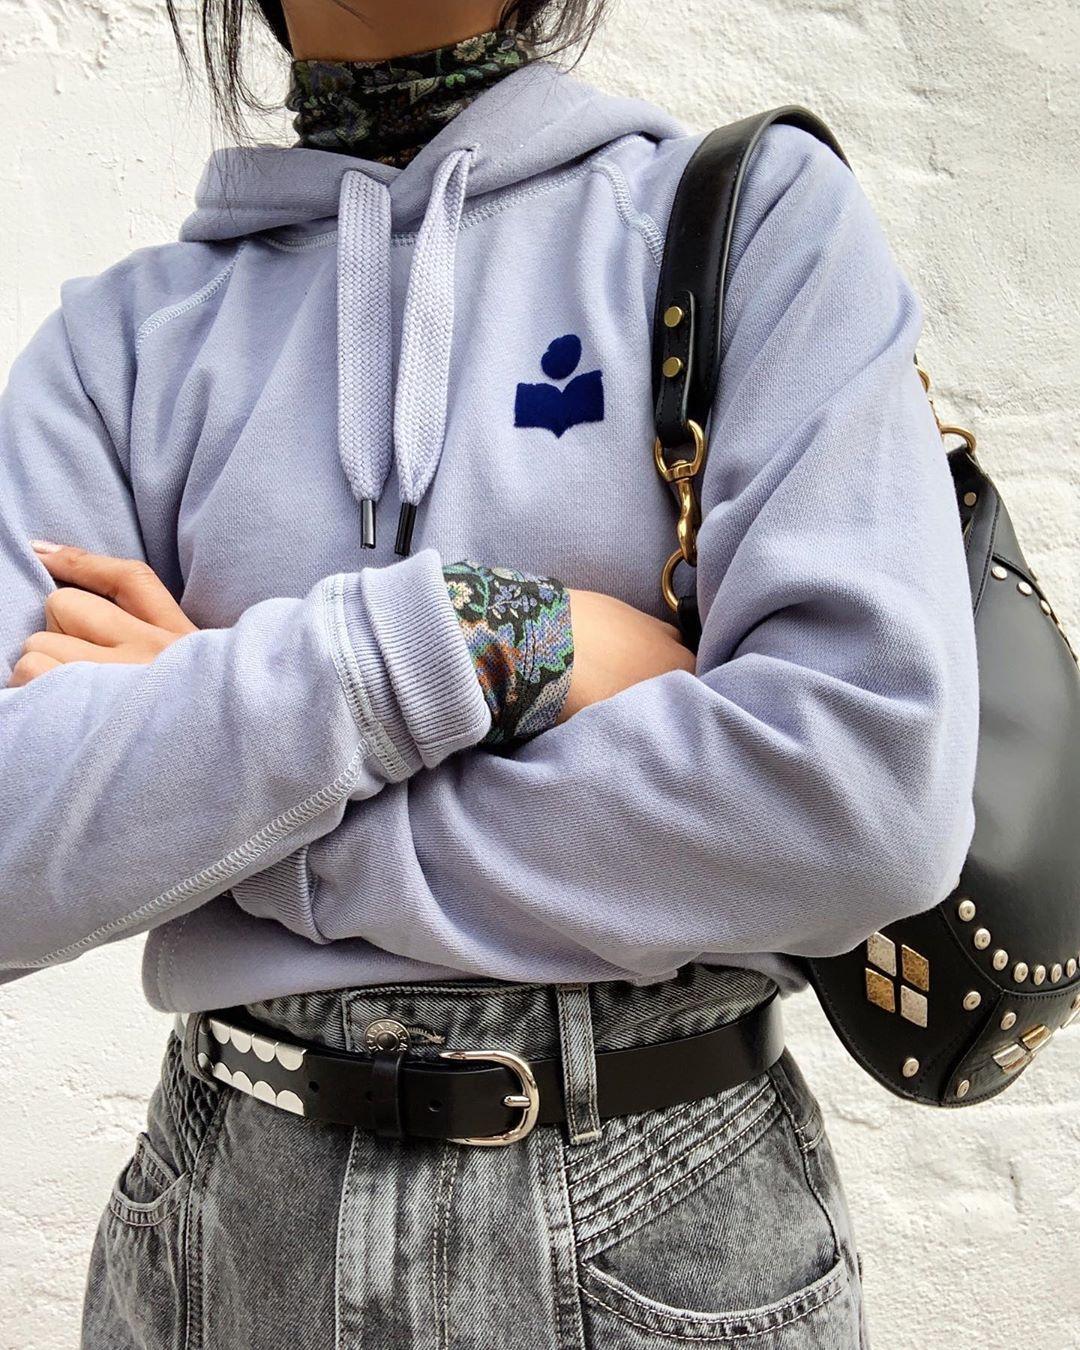 bag belt pants top sweater